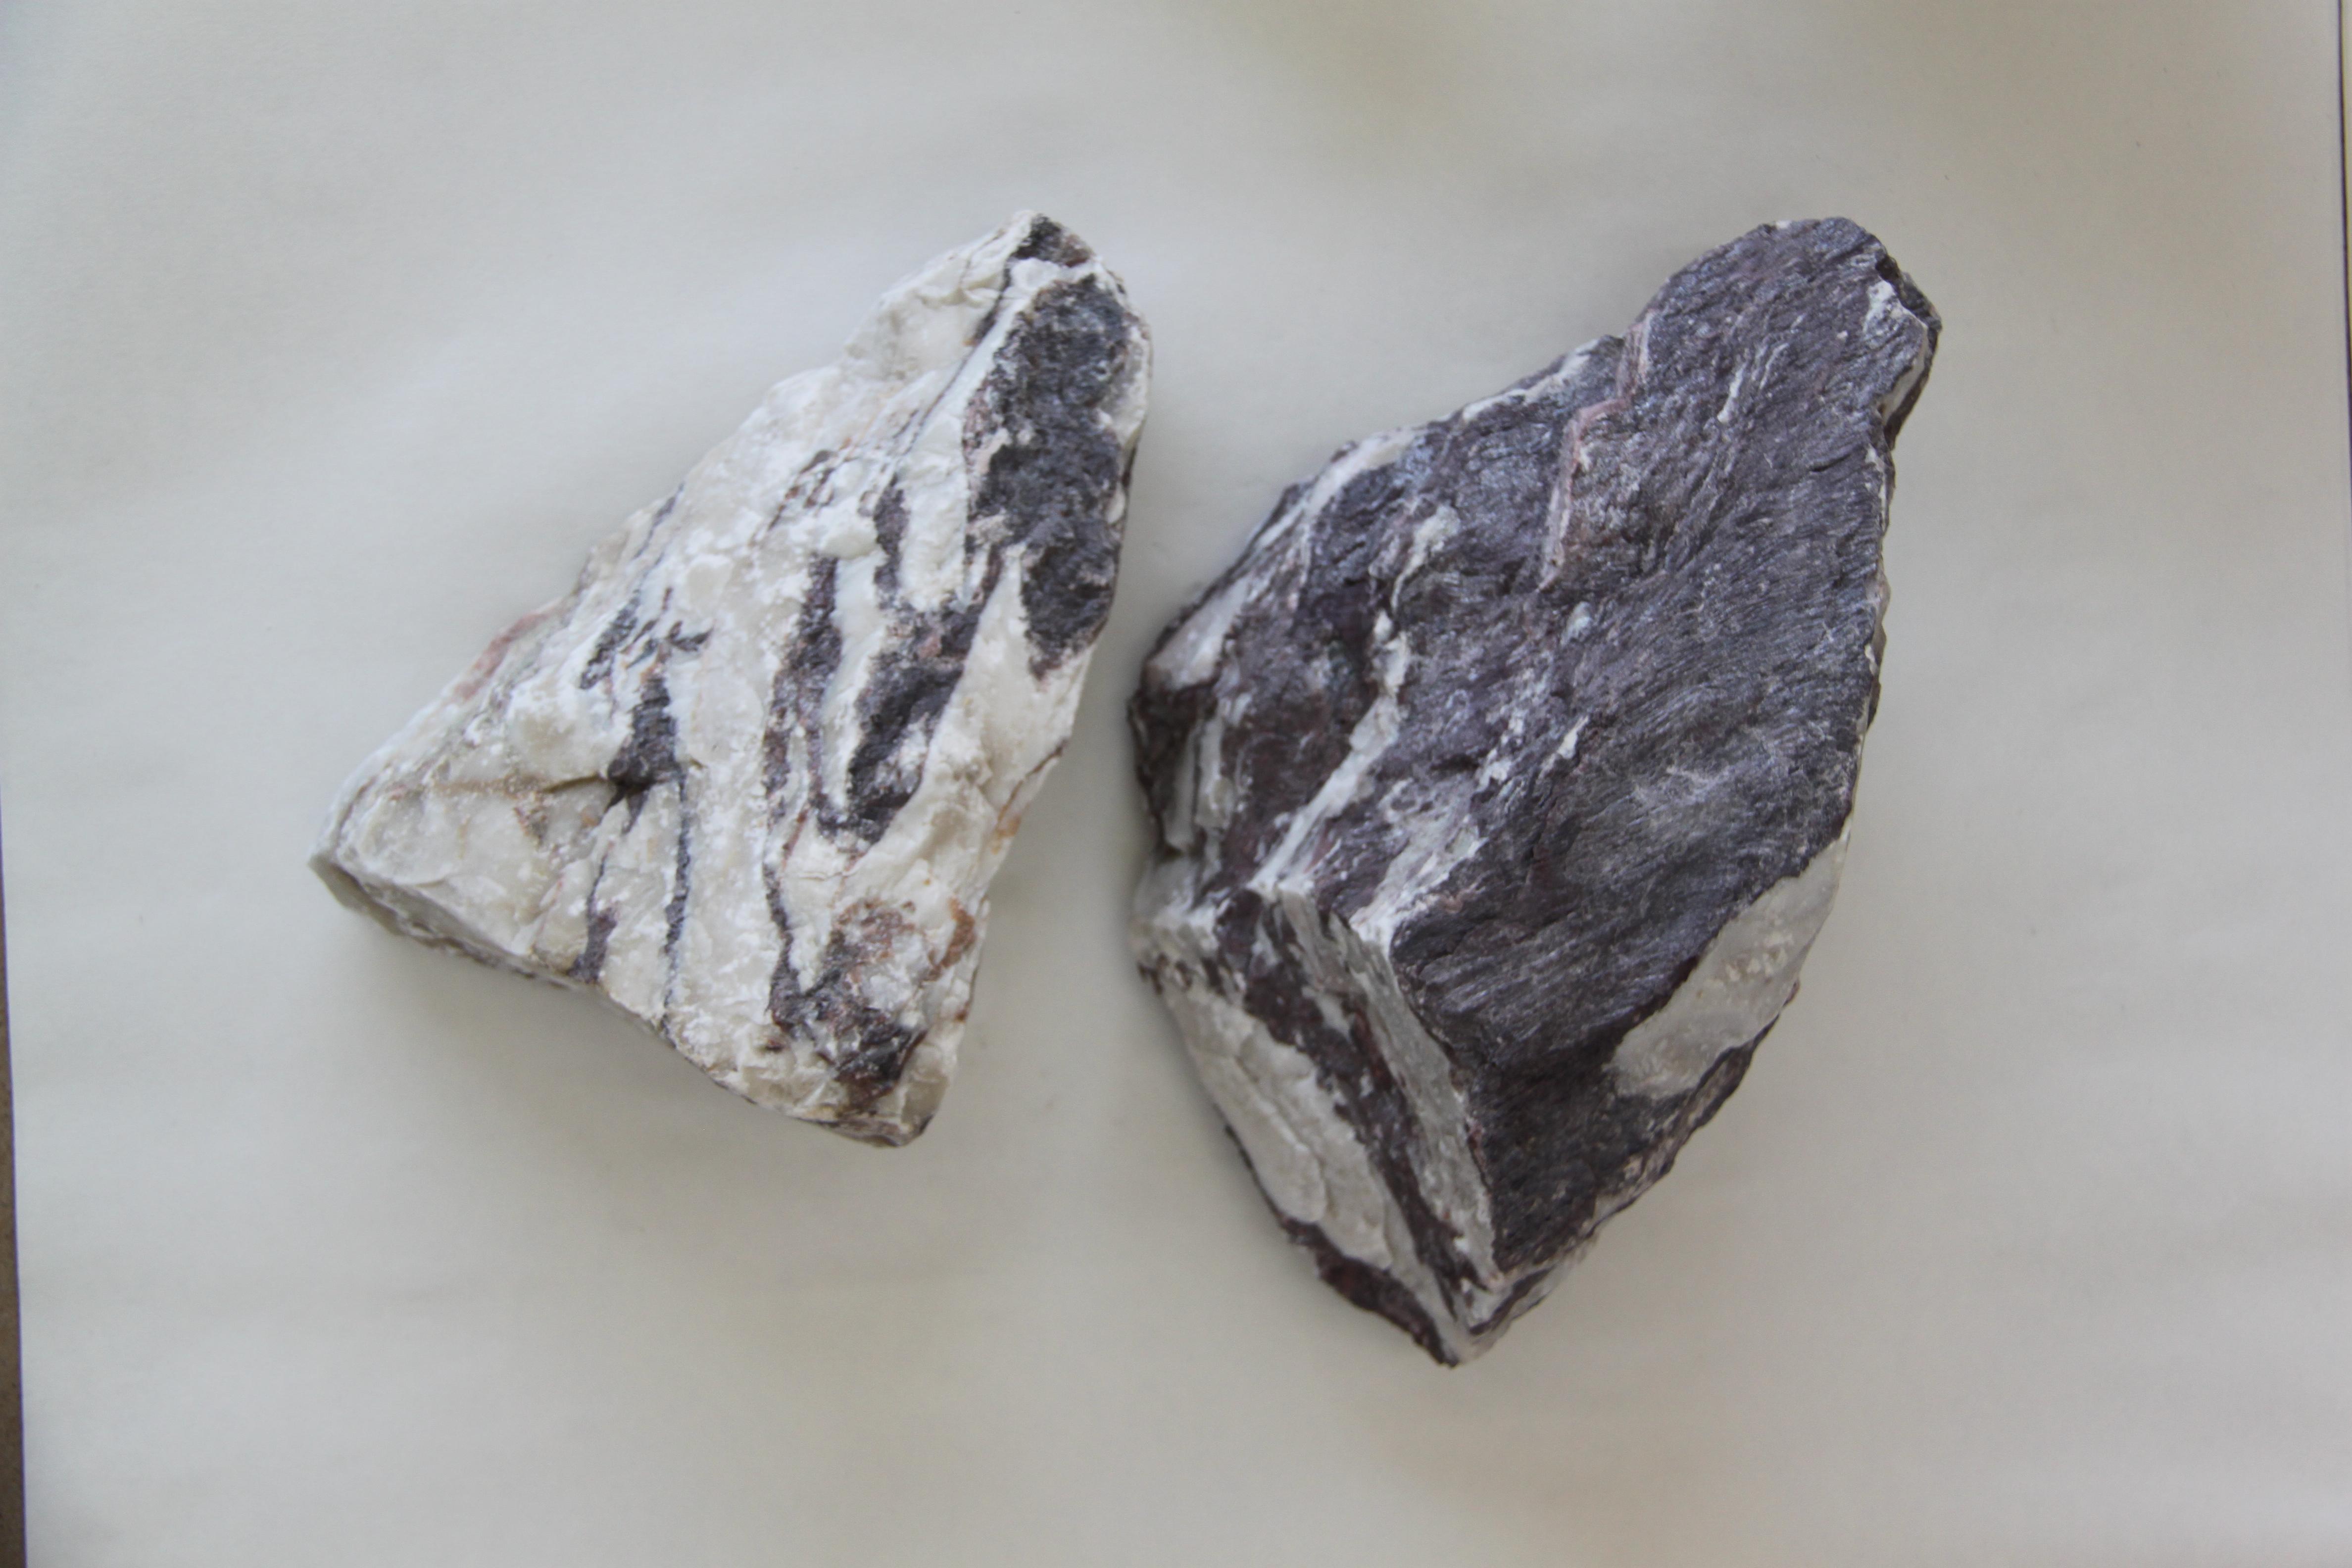 Piedra m rmol p rpura bur s s a u for Marmol informacion